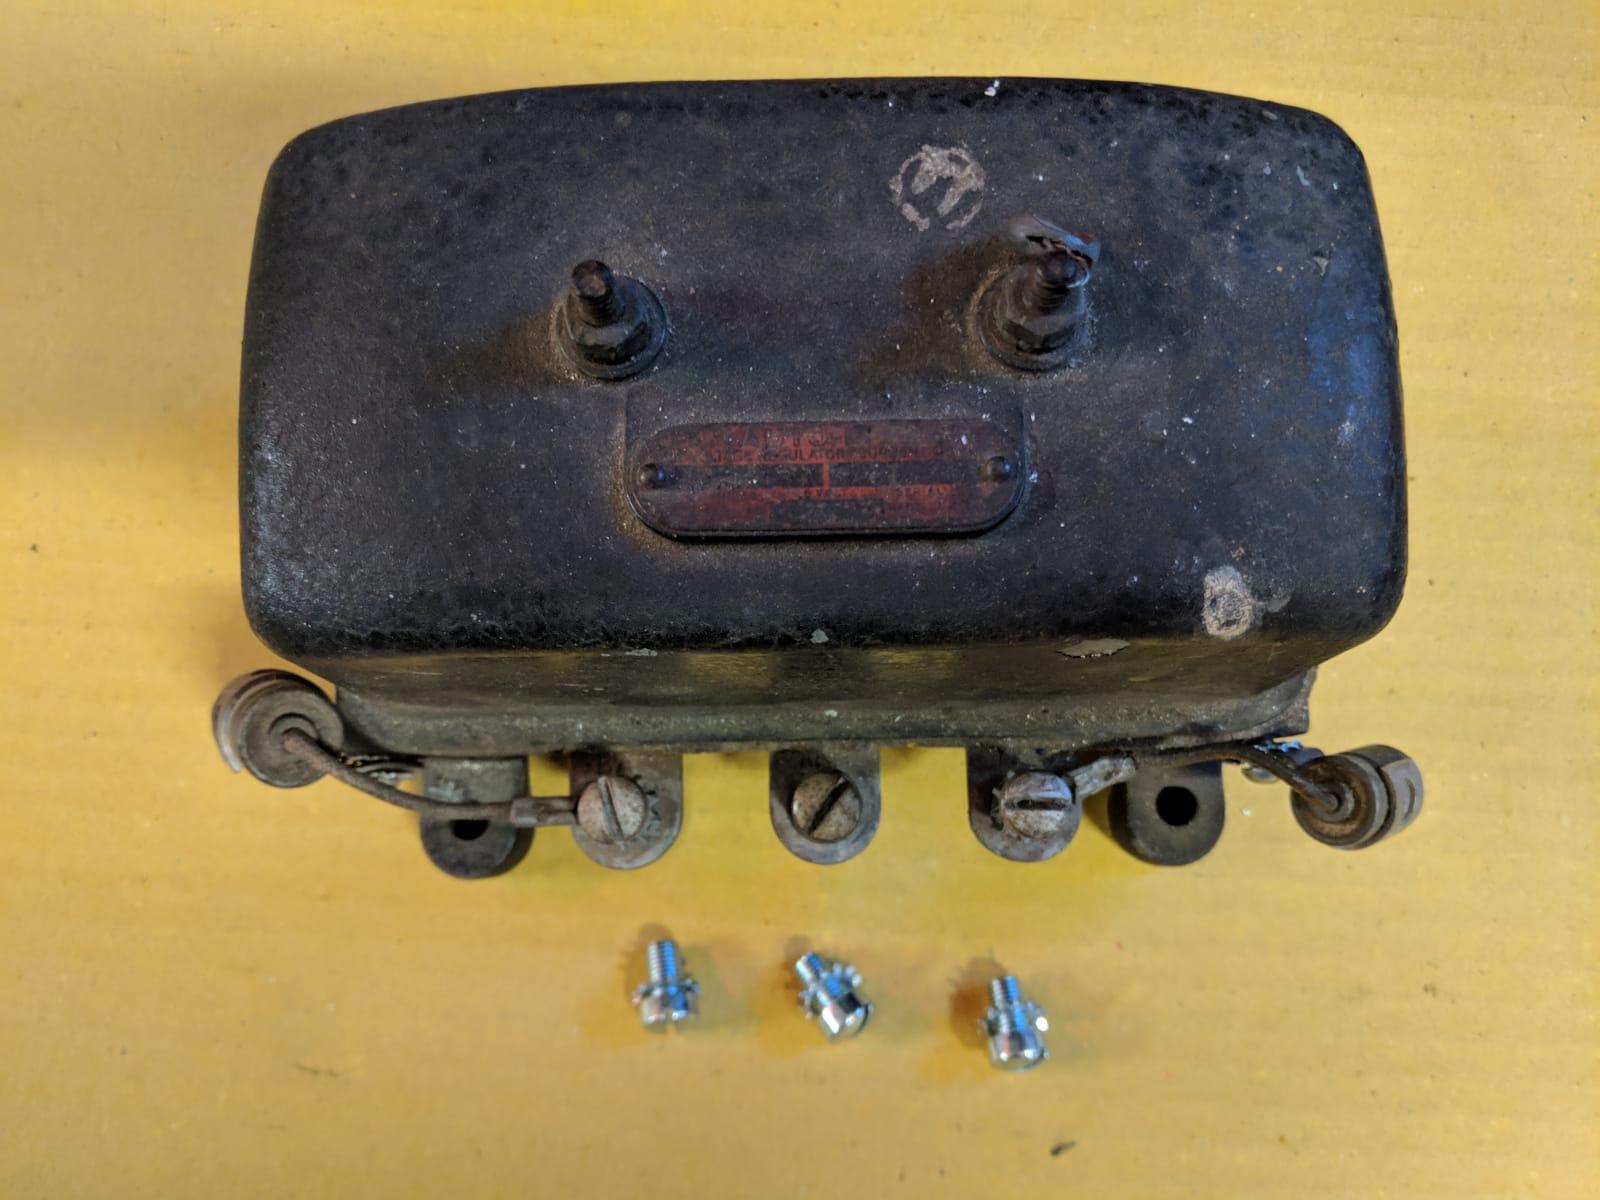 regulator terminal screws